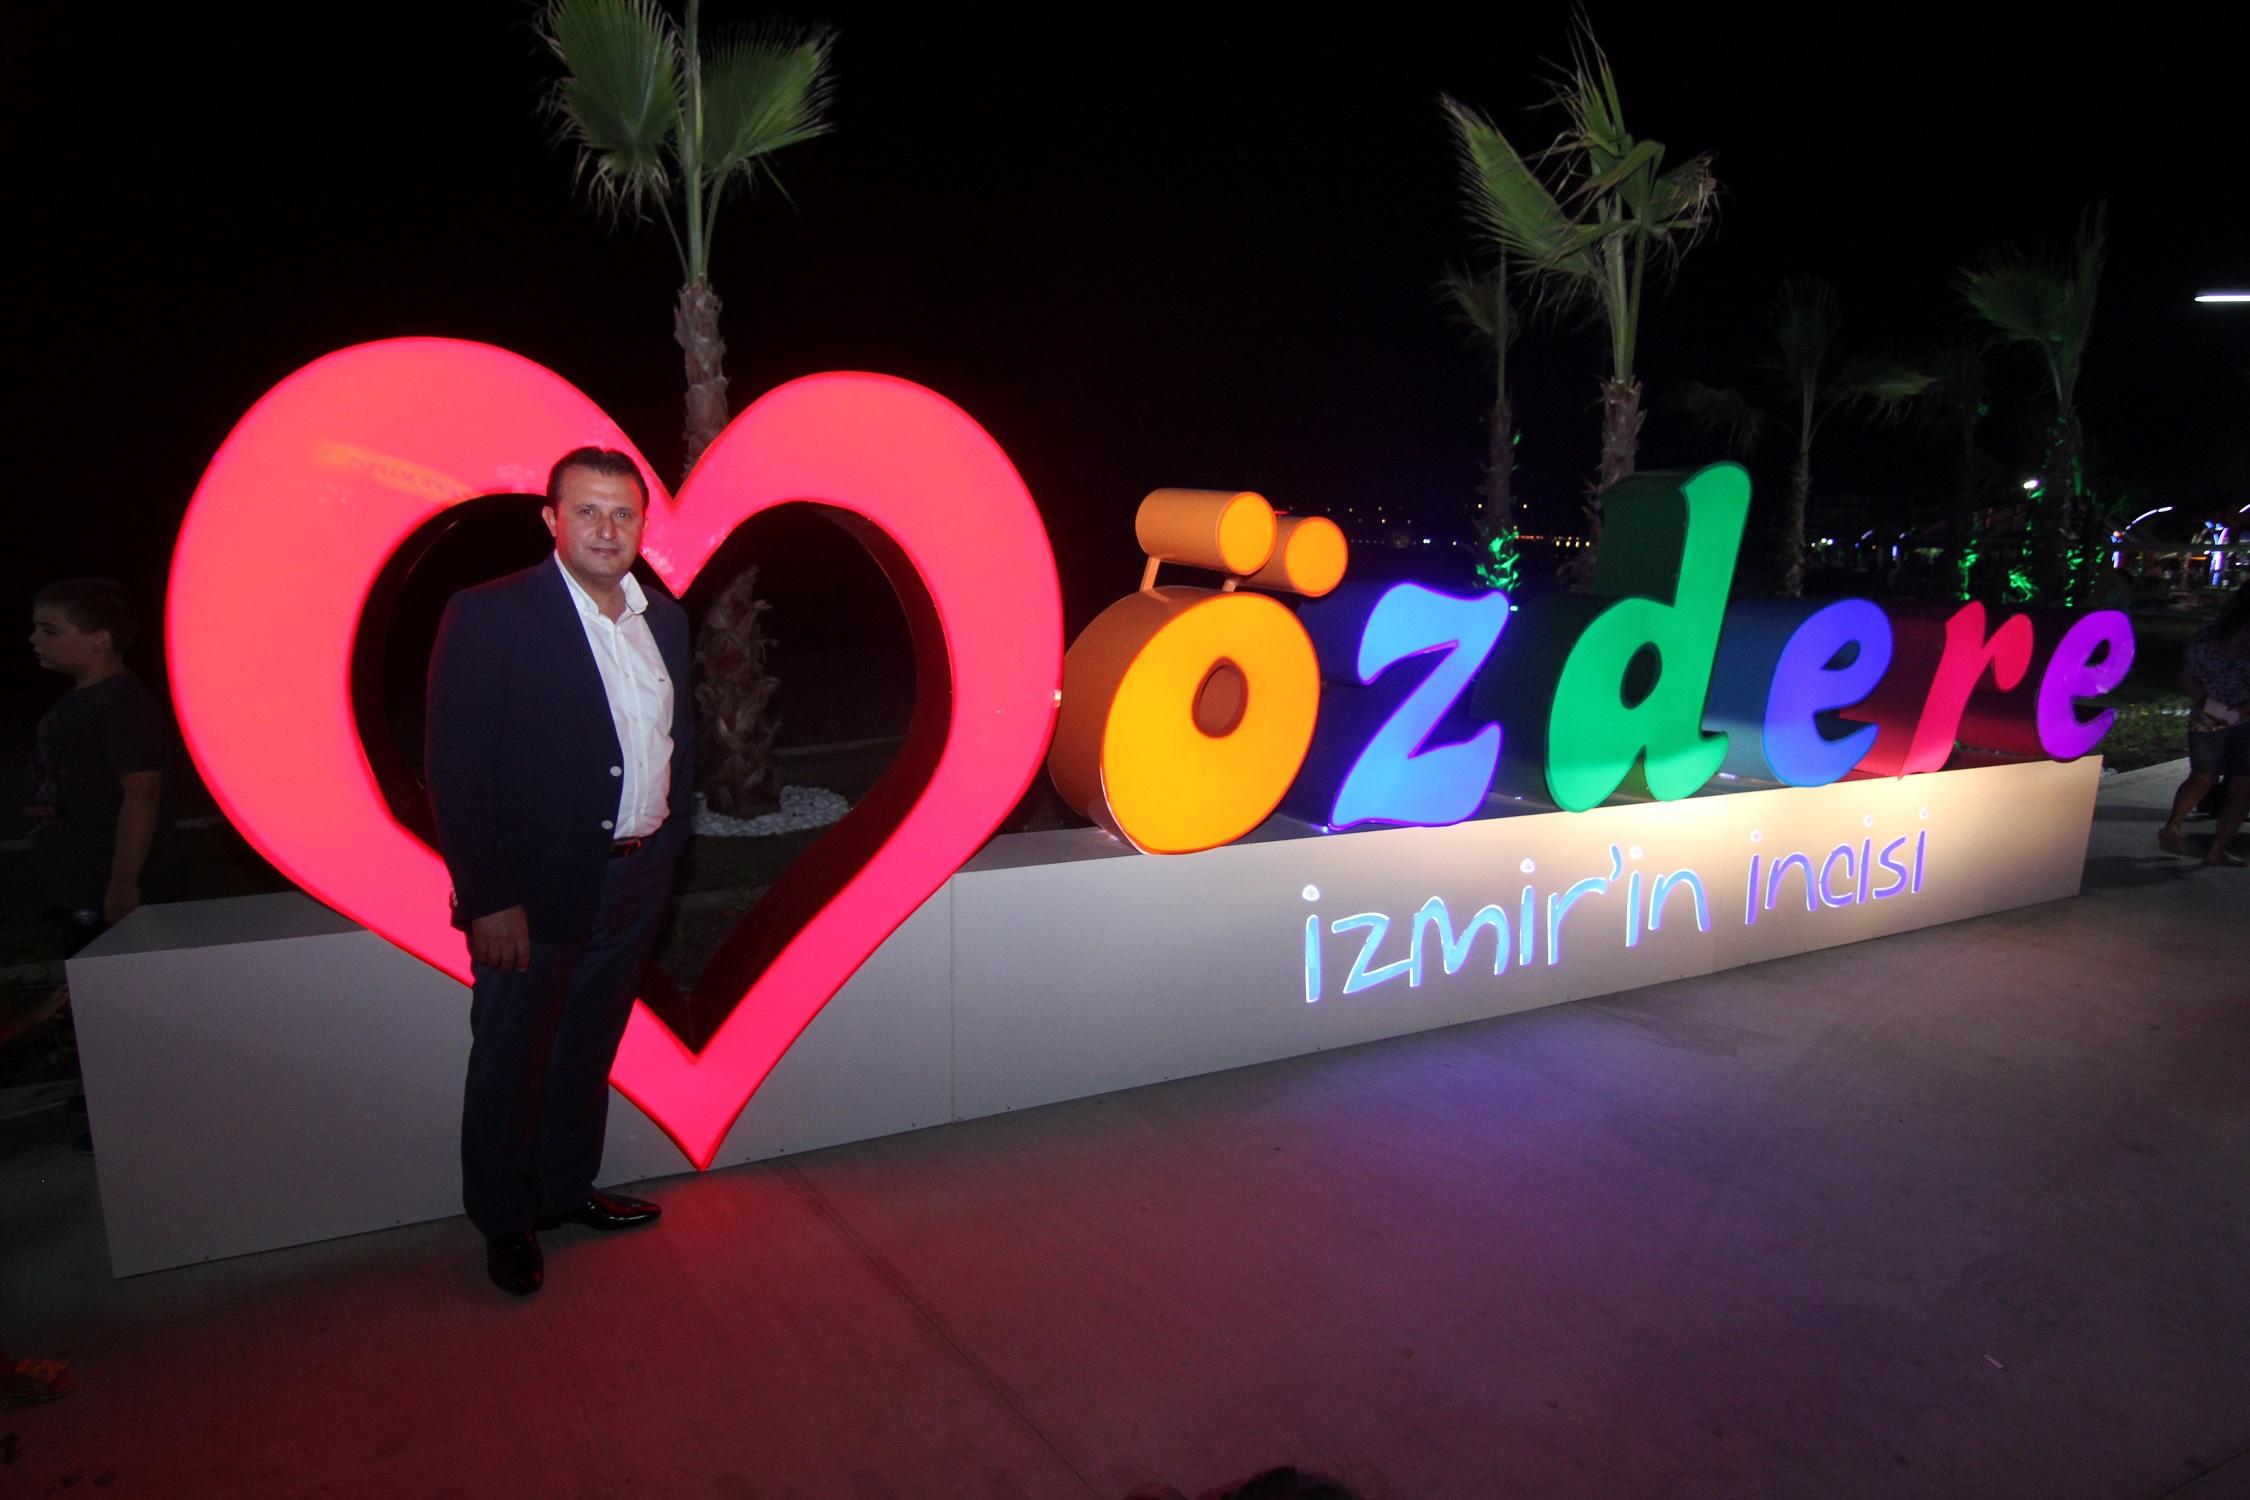 İzmir'in İncisinde İlk Etkinlik